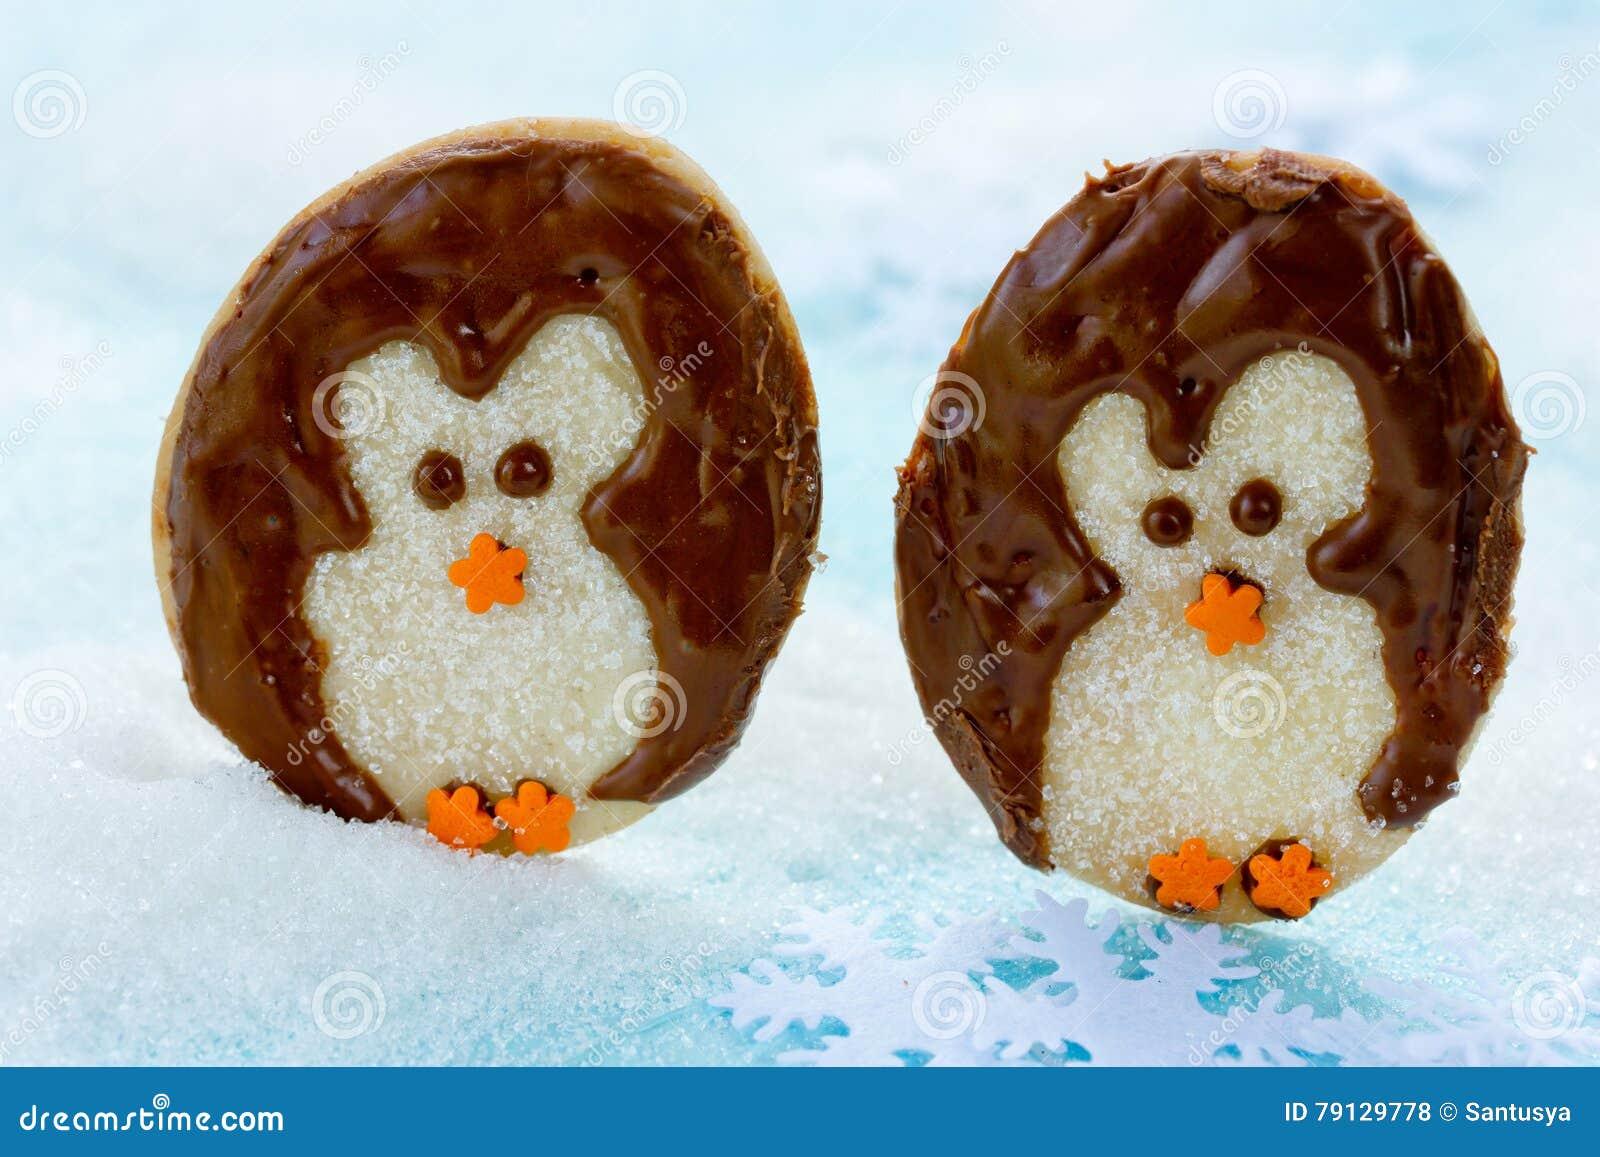 Penguin Sugar Cookies Christmas Cookie Idea Stock Photo Image Of